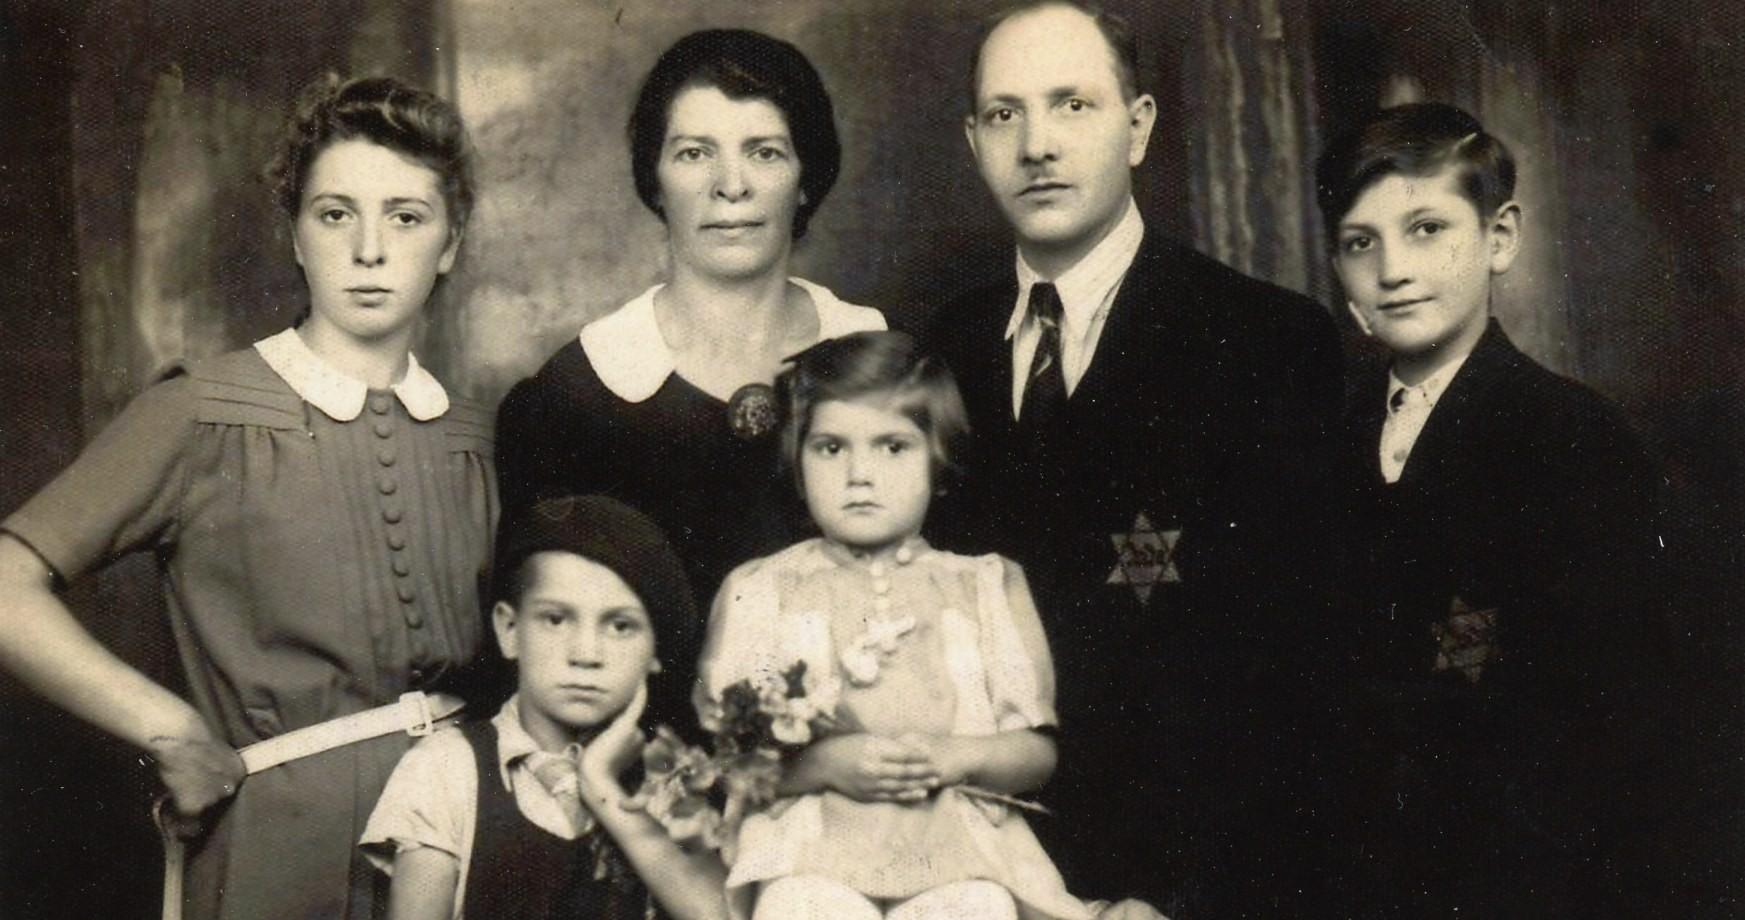 Seeking Kin Photo Brings Desperate Hope For A Holocaust